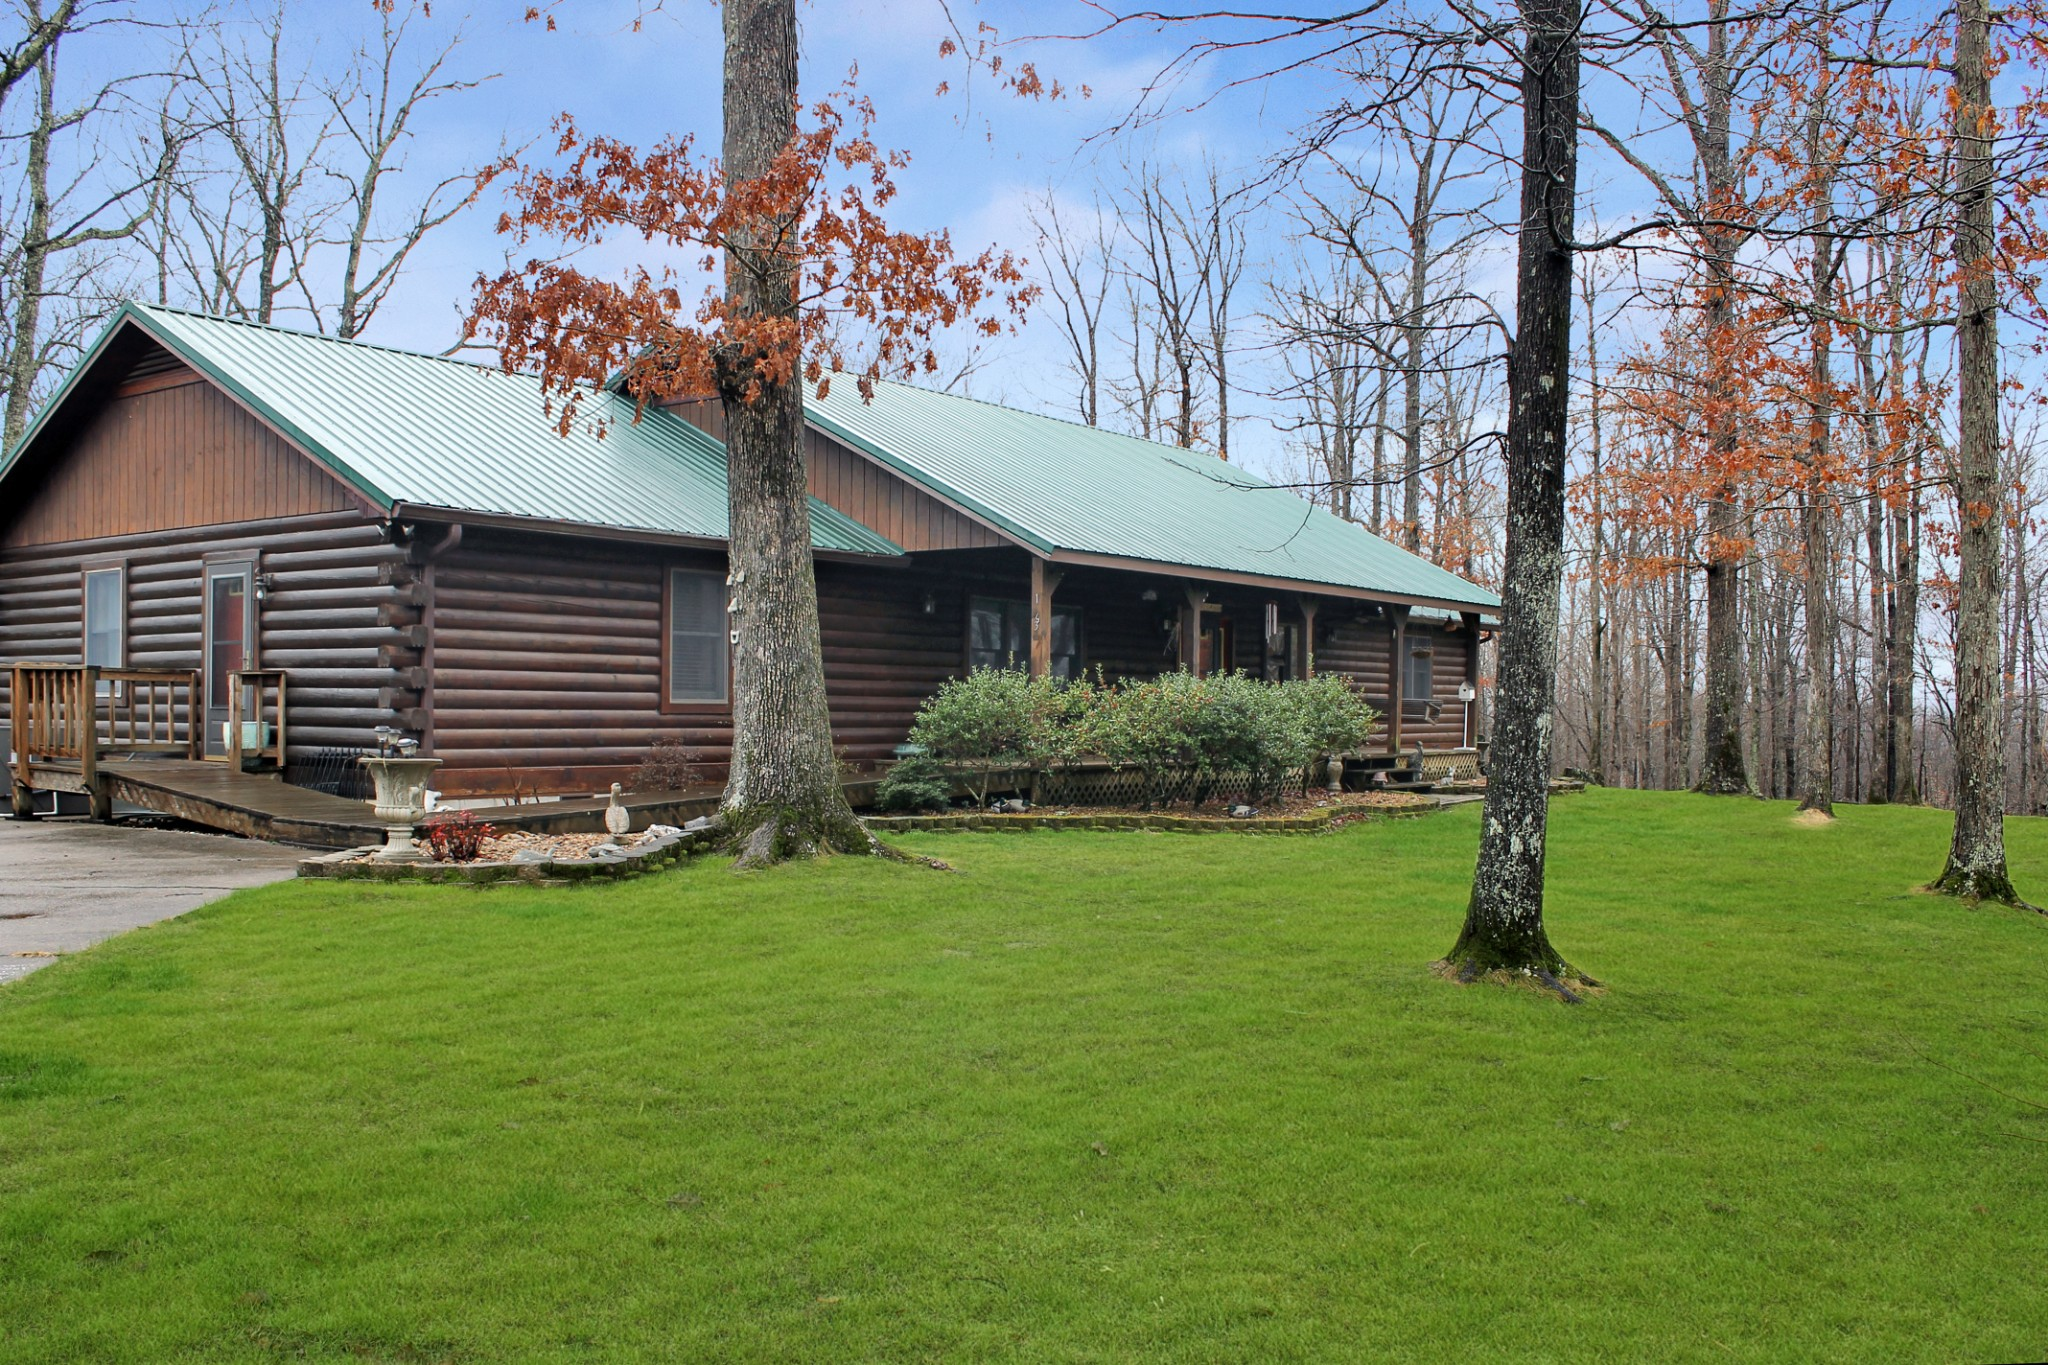 153 Thomas Rd, Dover, TN 37058 - Dover, TN real estate listing